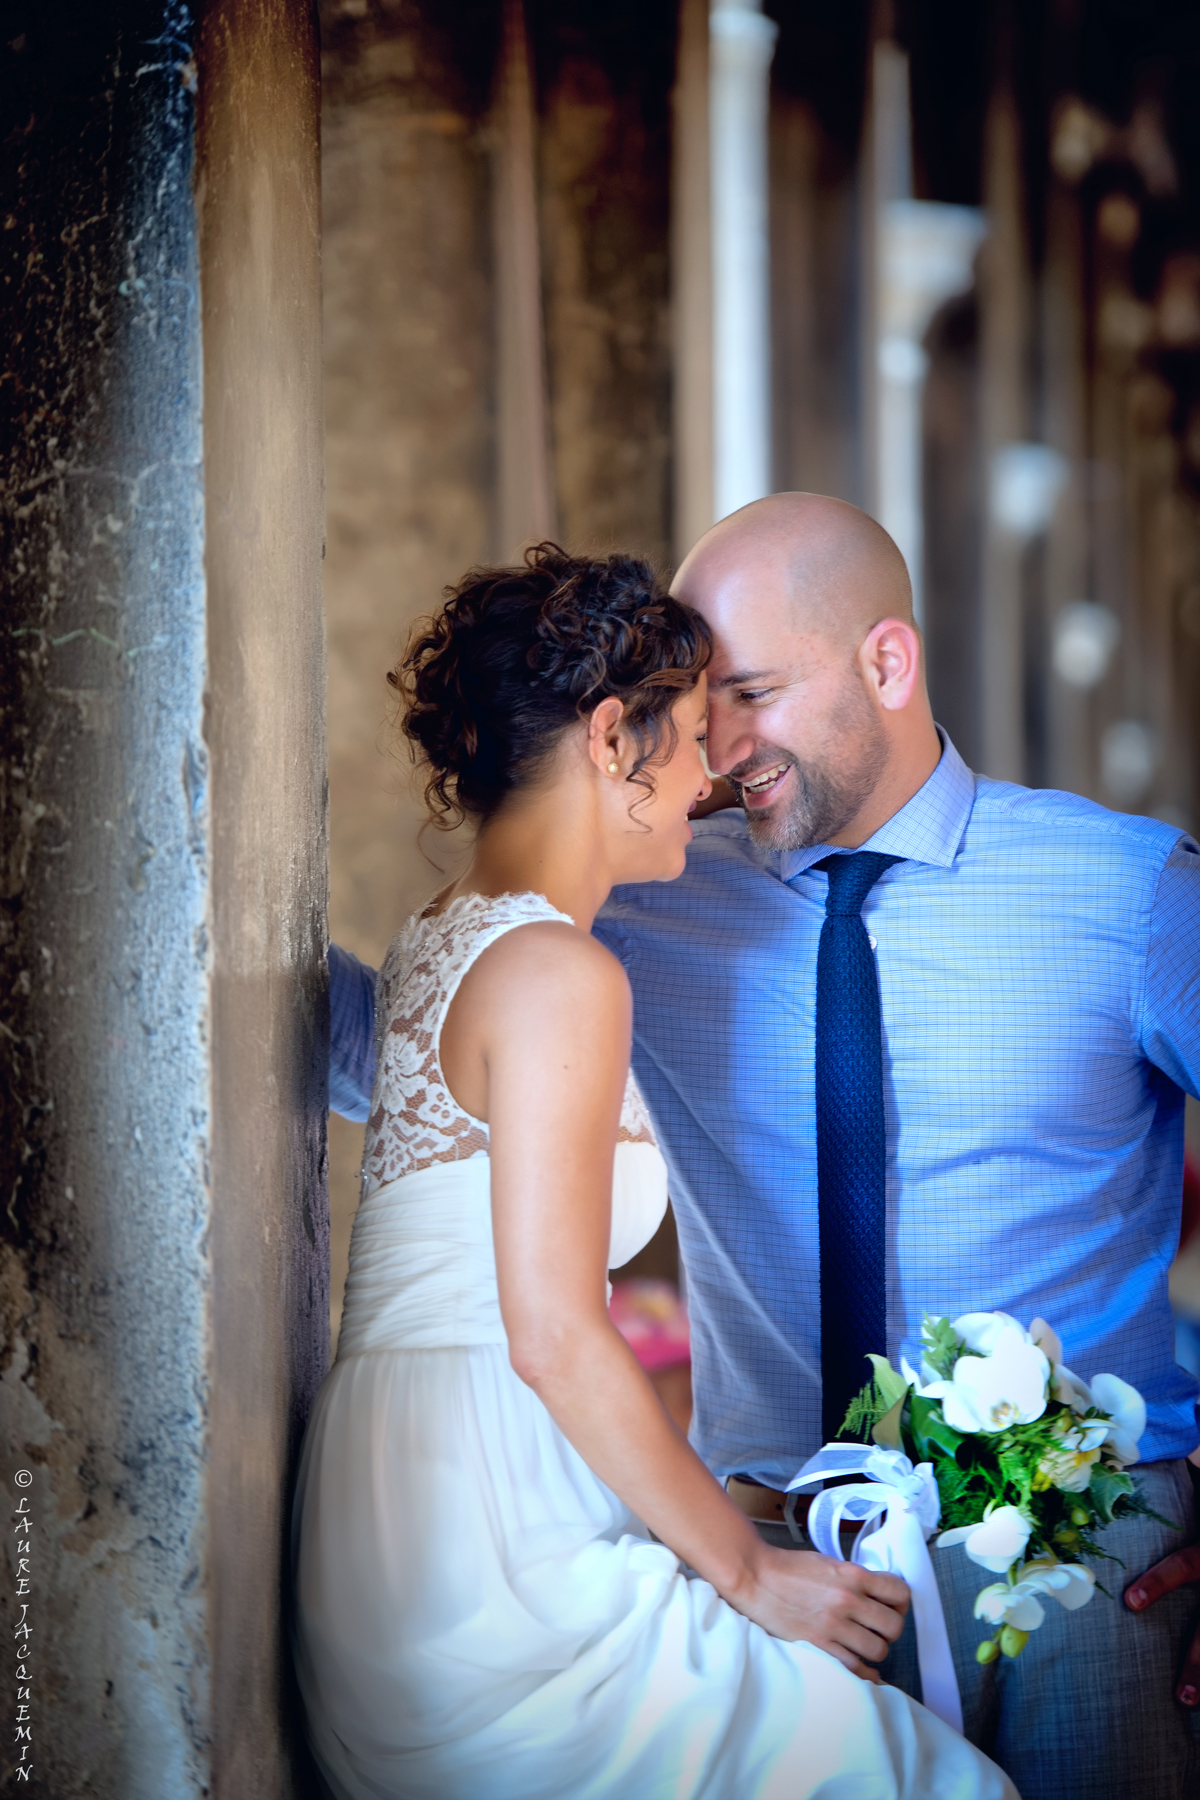 mariage venise photographe palazzo cavalli venice wedding photographer (204).jpg